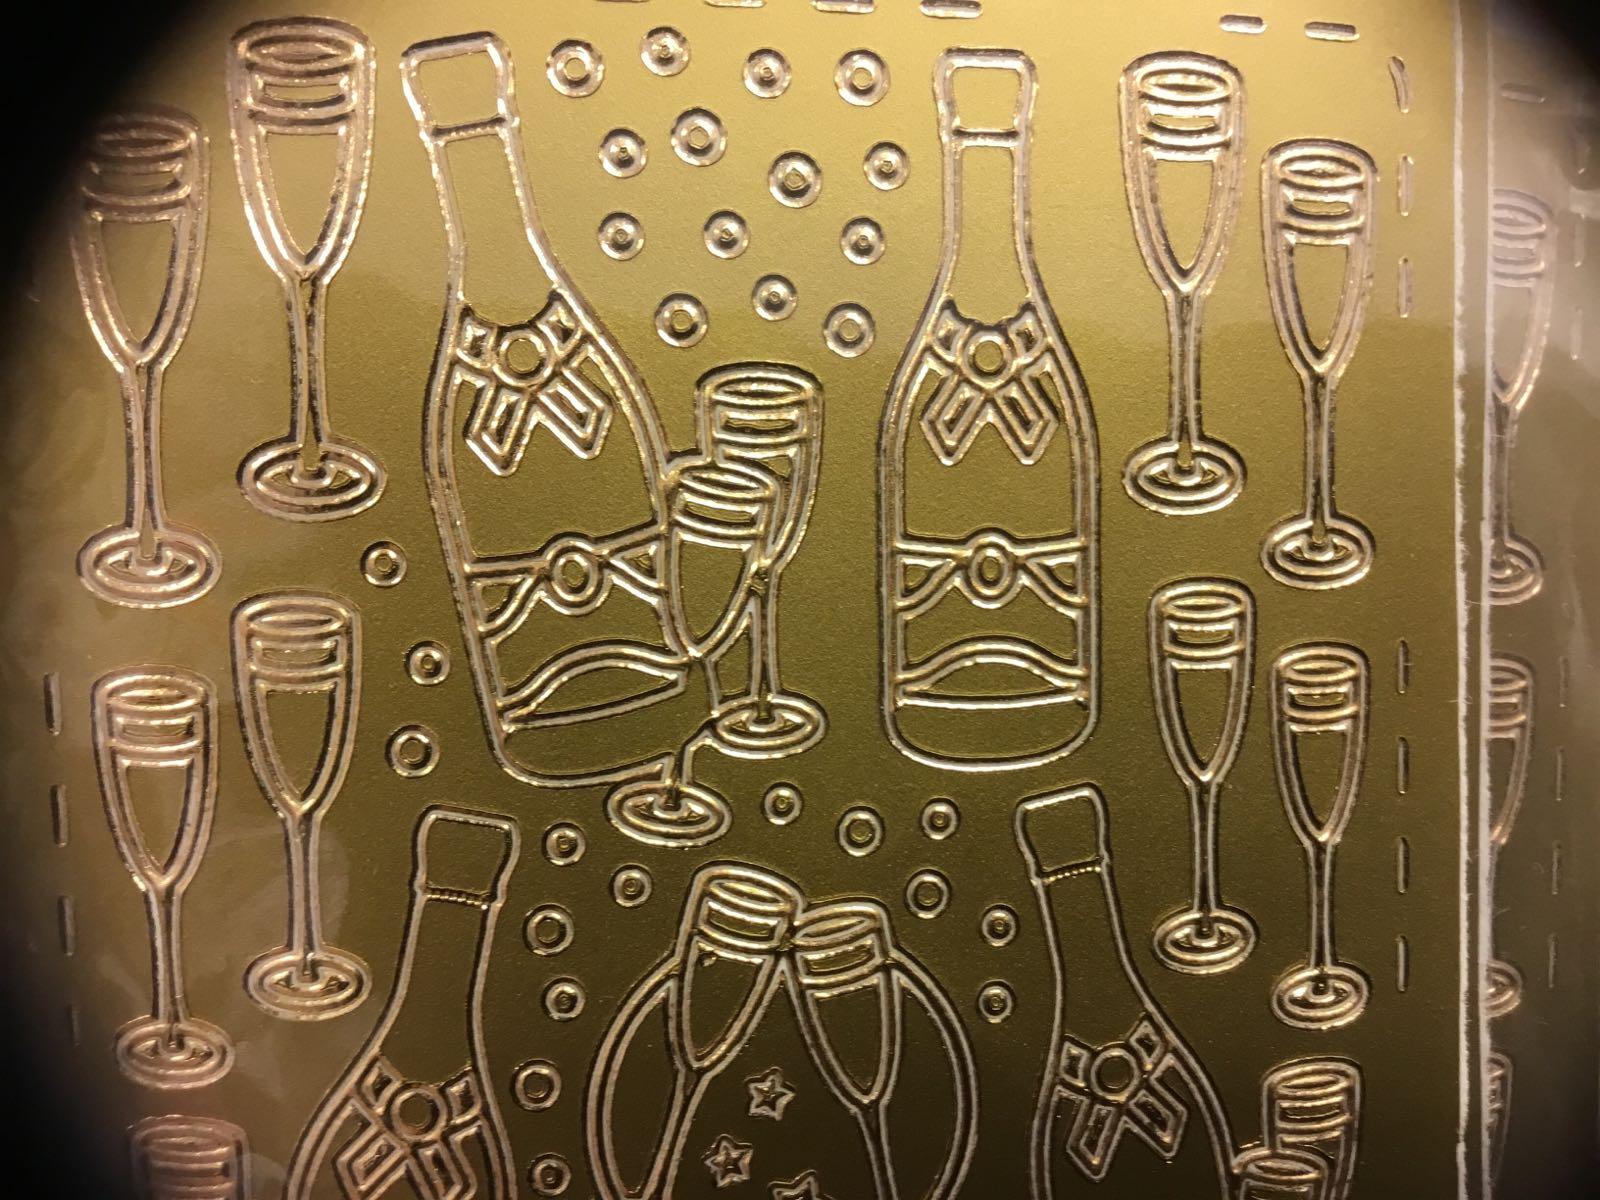 #klistremerker gull champagne flaske  glass sprudlende